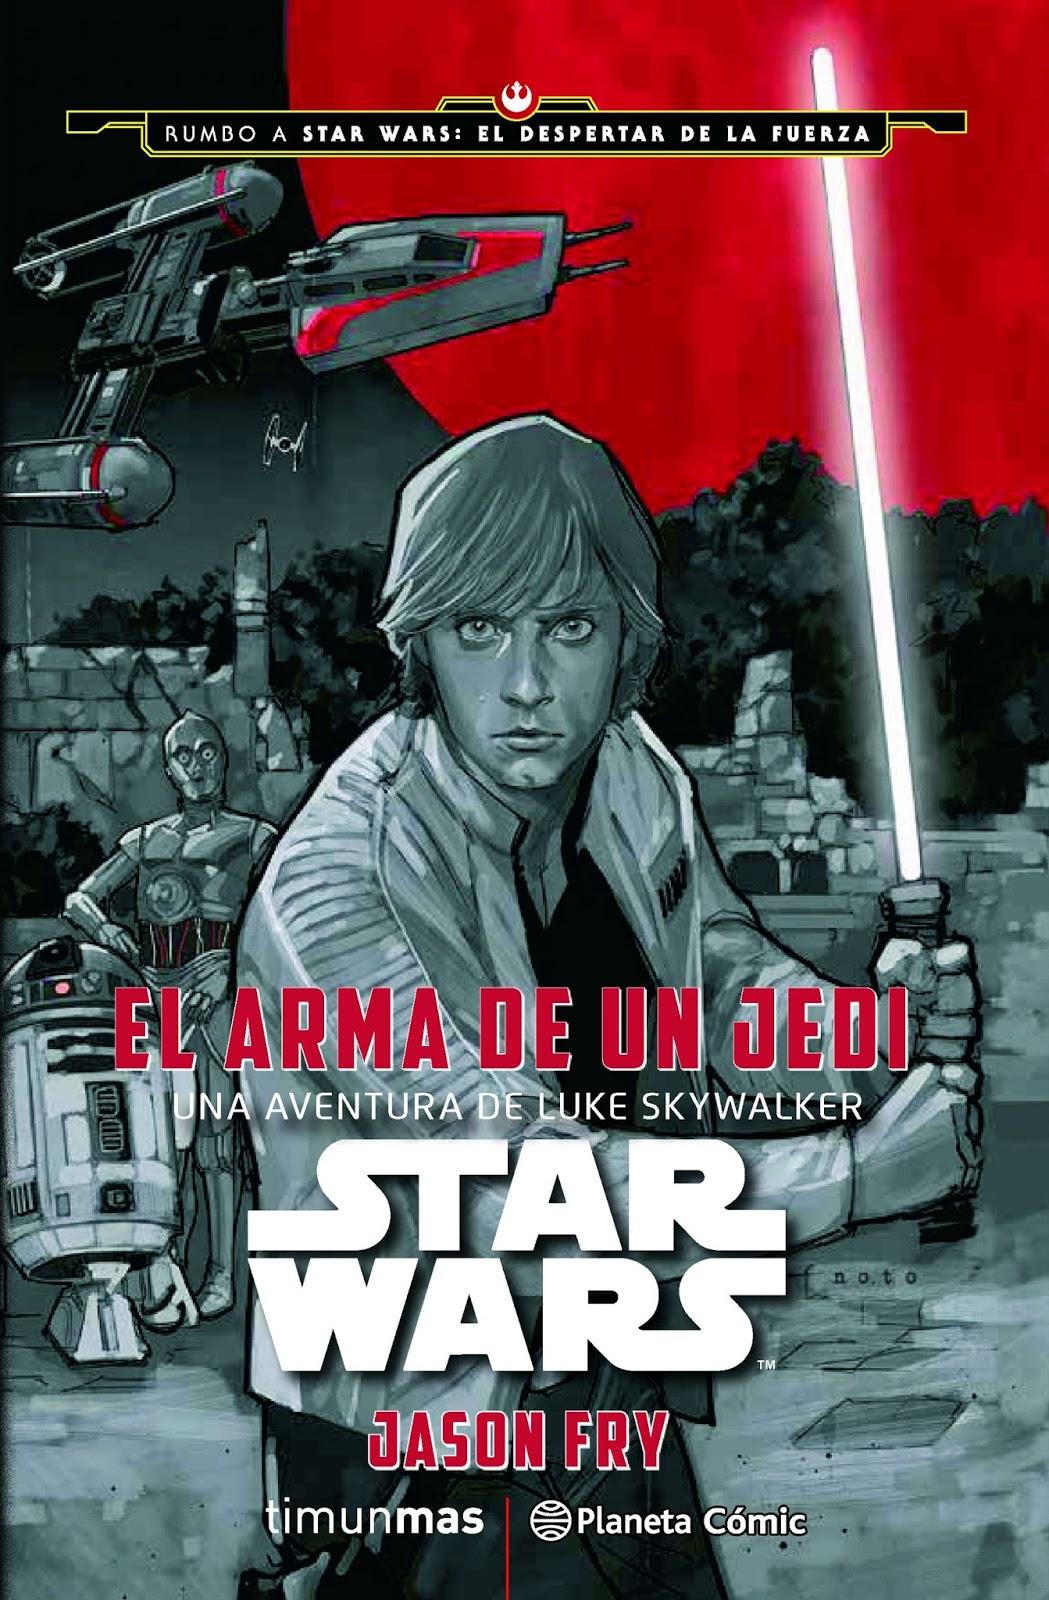 GALAXY-COMICS: Planeta Comic. Star wars. cómics y libros